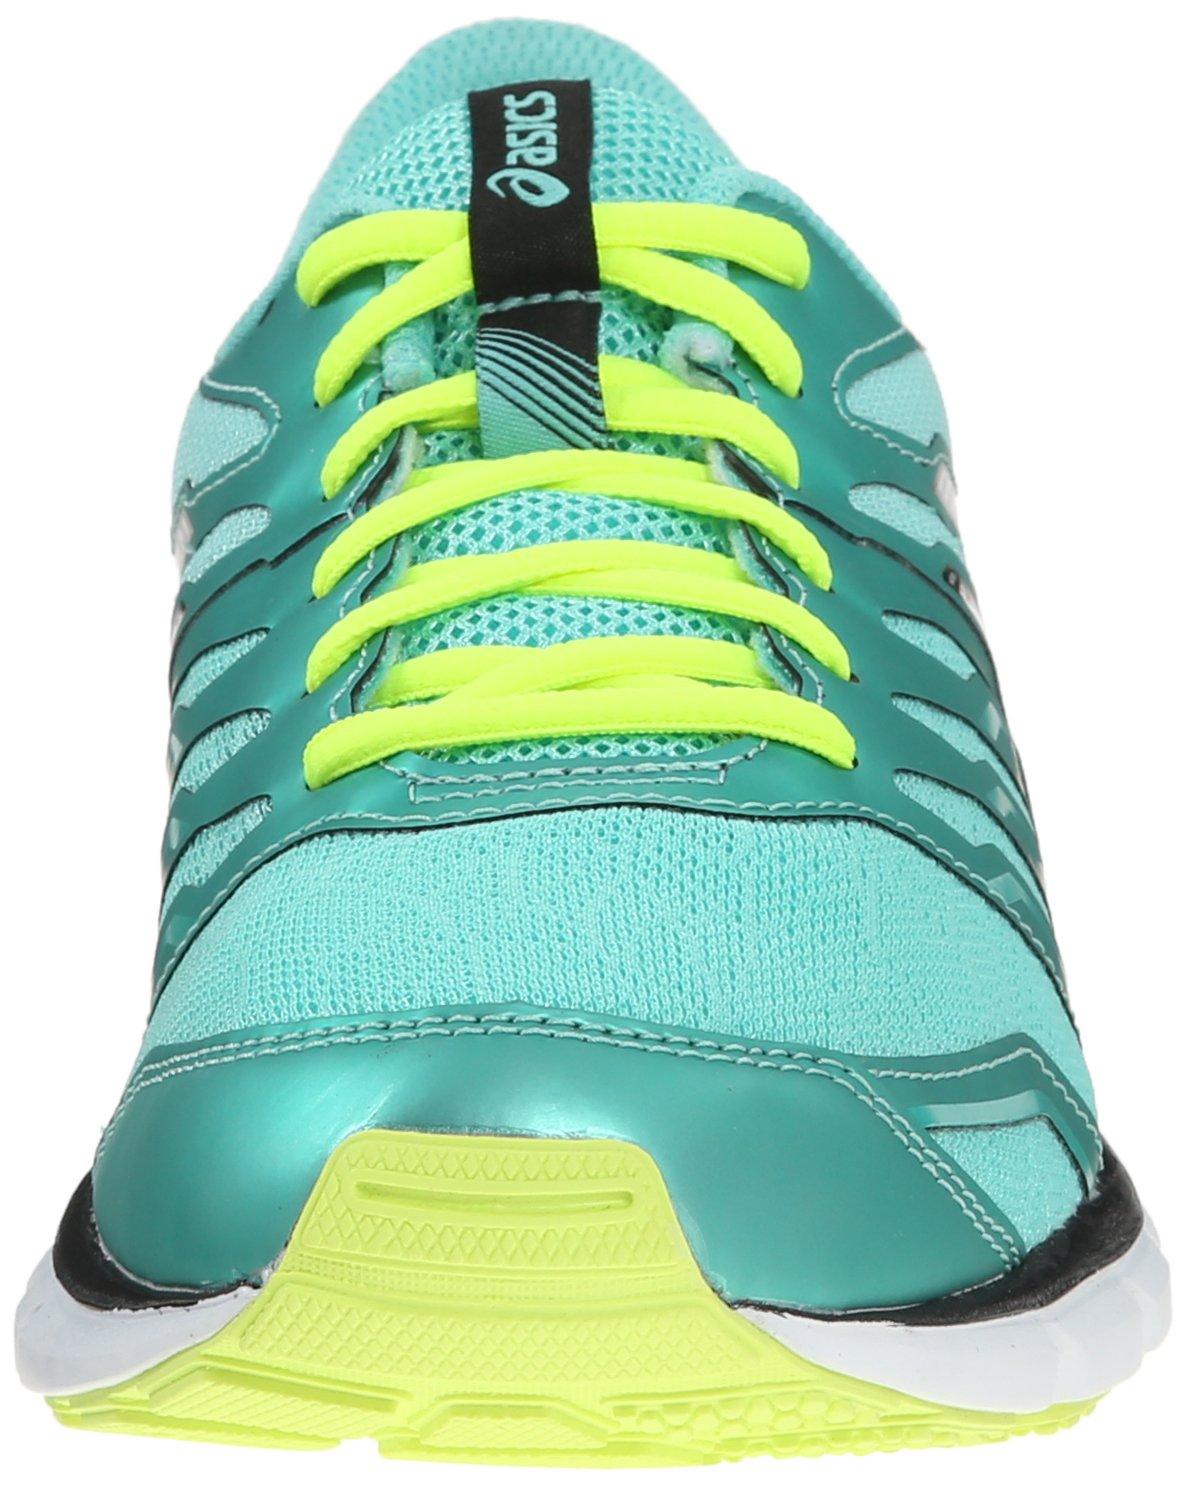 Zapato de 4/ running de de ASICS GEL Zaraca 4 mujer pour Zapato mujer Aqua Mint 0f9d5dd - shorttermhealthinsurance.website